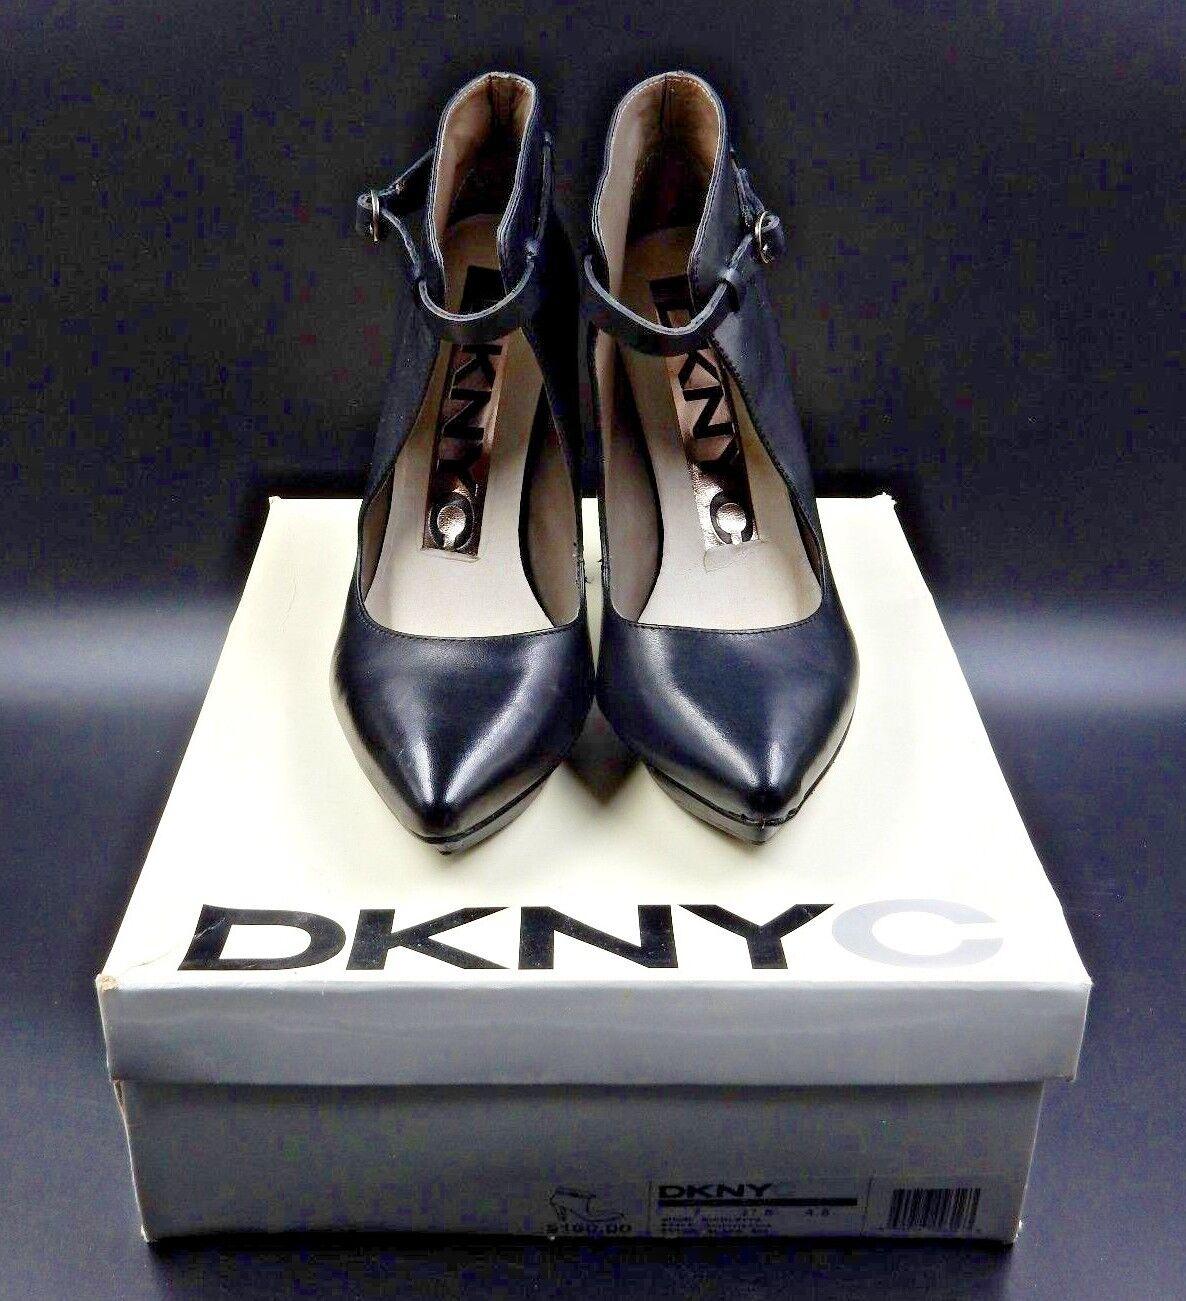 DKNY NICOLETTE CALF HEIGHT OPEN FRONT POINTED TOE HEELED schwarz Stiefel - Größe 7